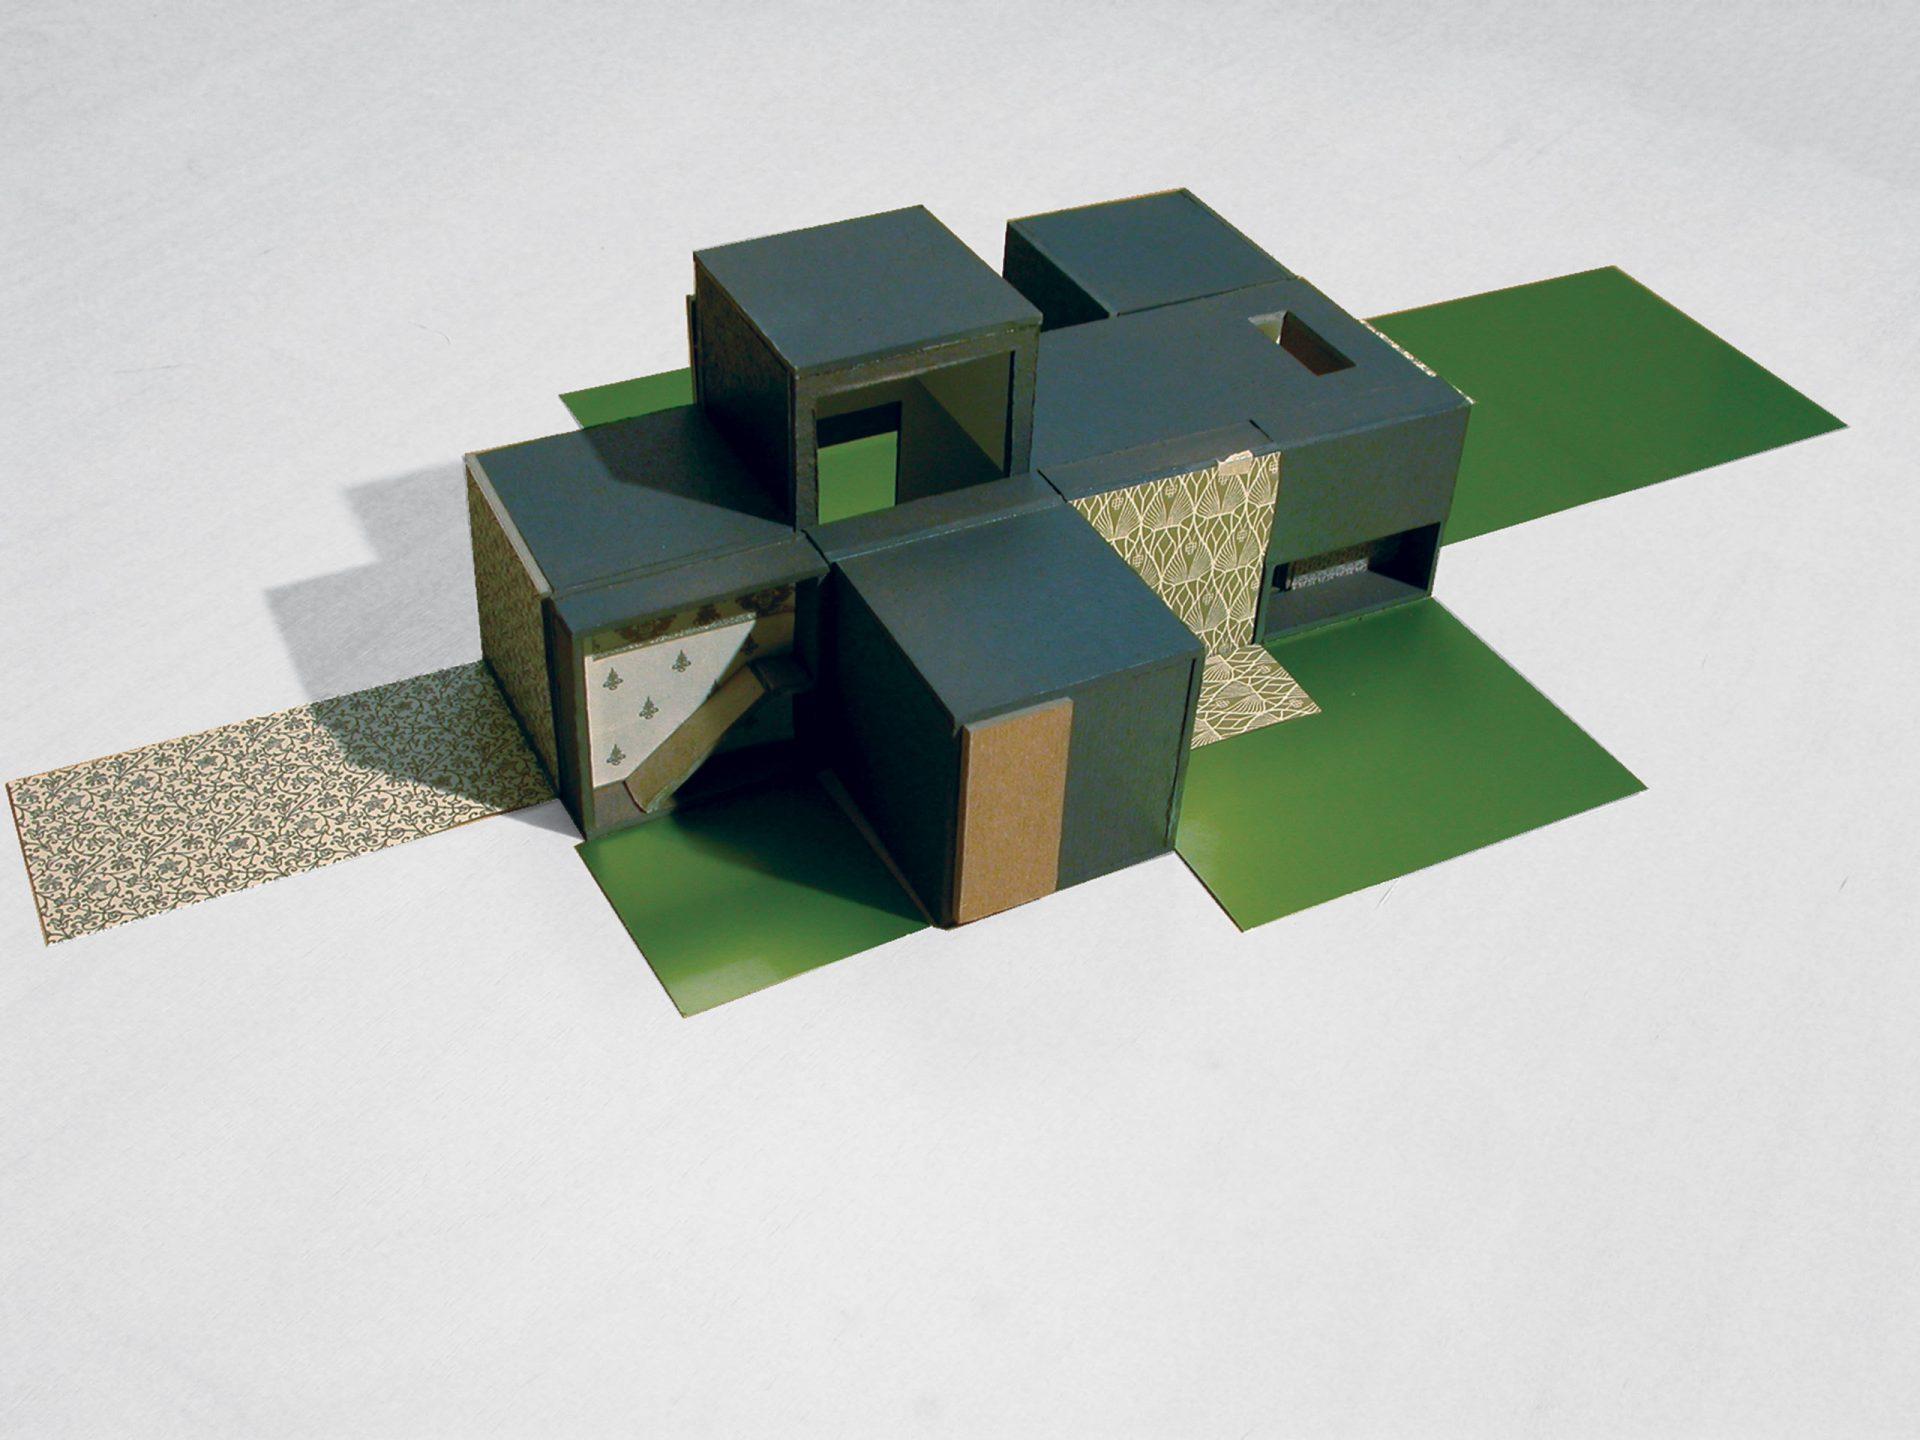 Kamers Model Garden